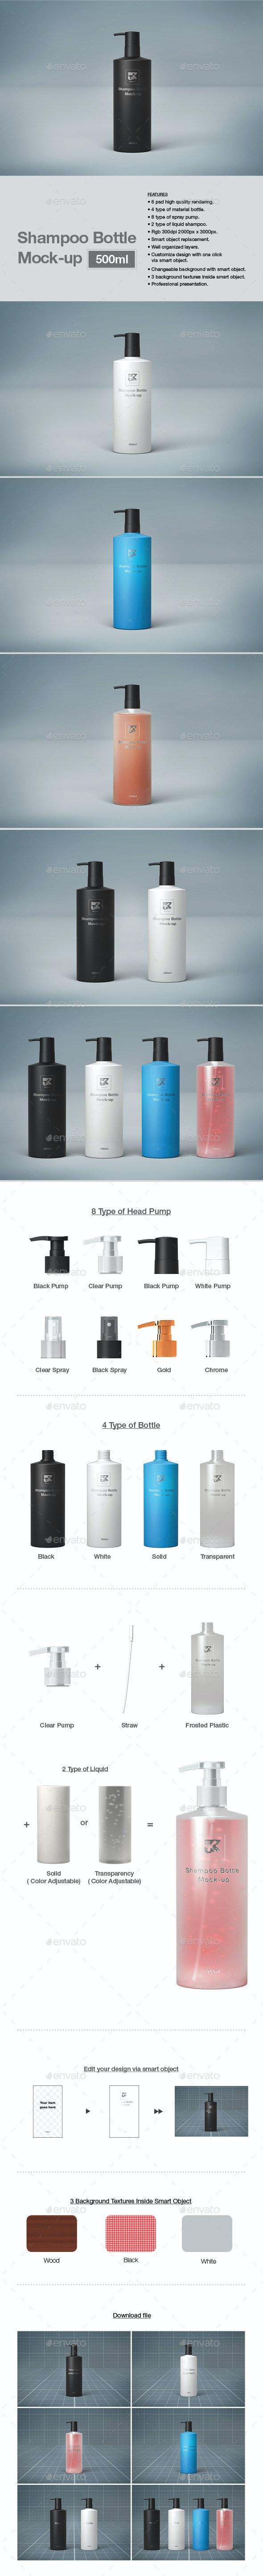 500ml Shampoo Bottle Mock-up - Product Mock-Ups Graphics